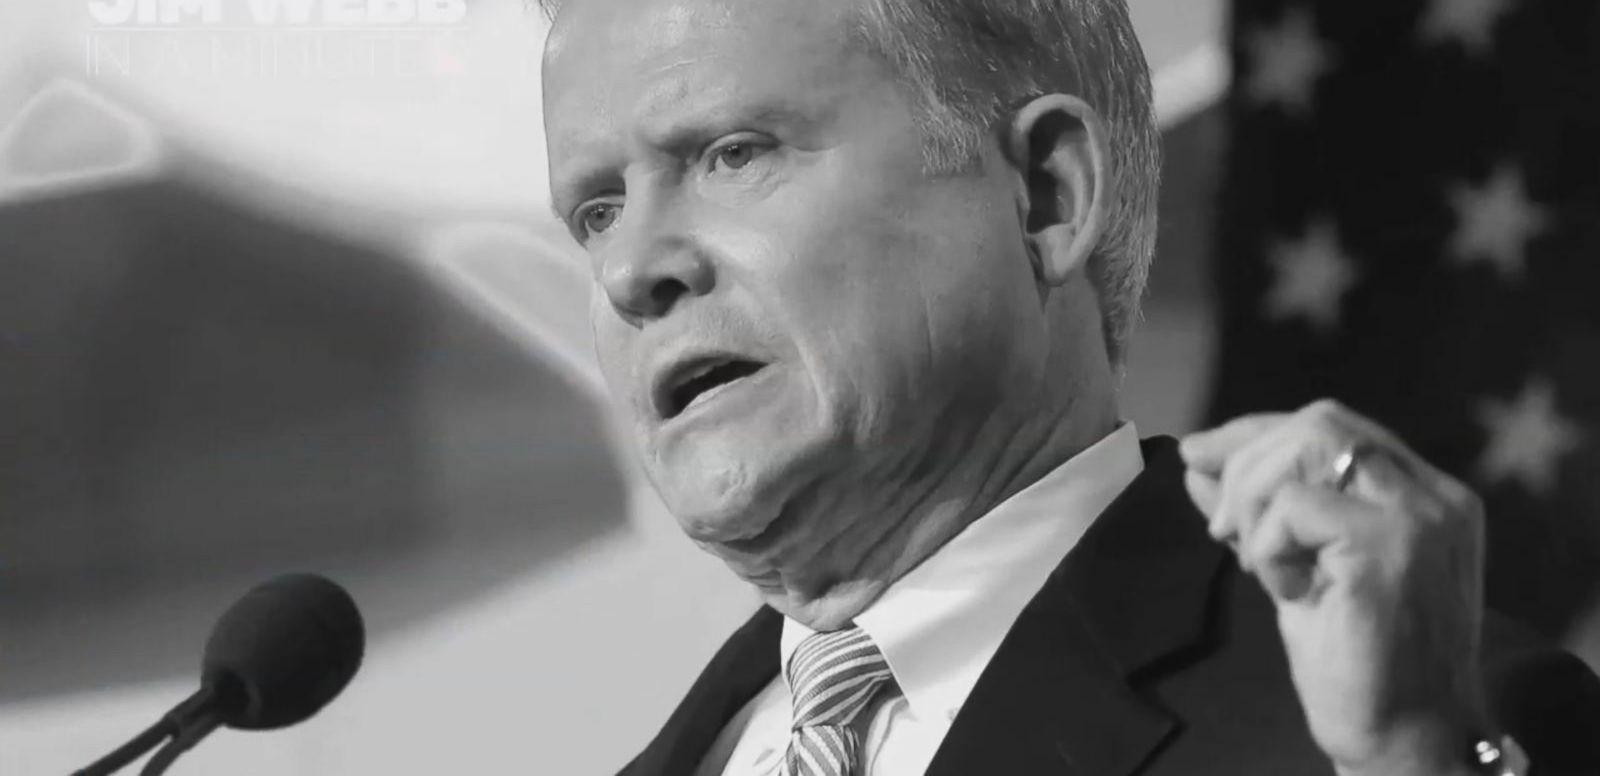 VIDEO: Jim Webb in a Minute